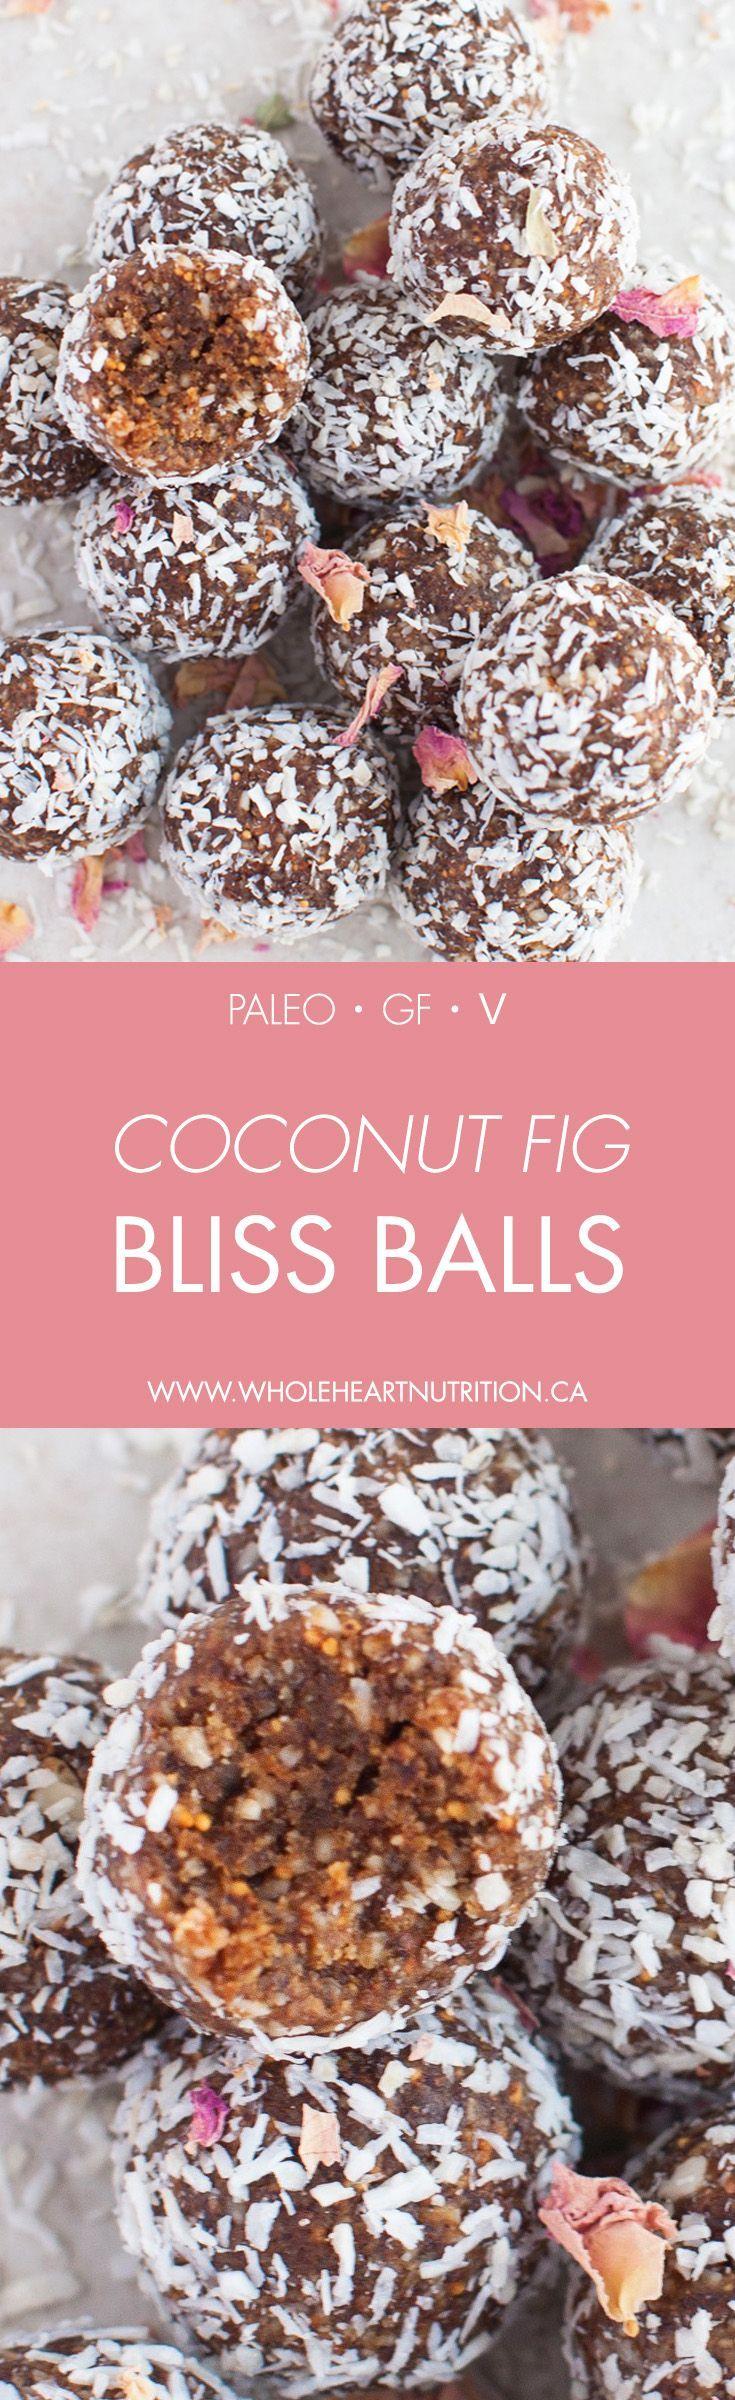 Coconut Fig Bliss Balls - Wholeheart Nutrition